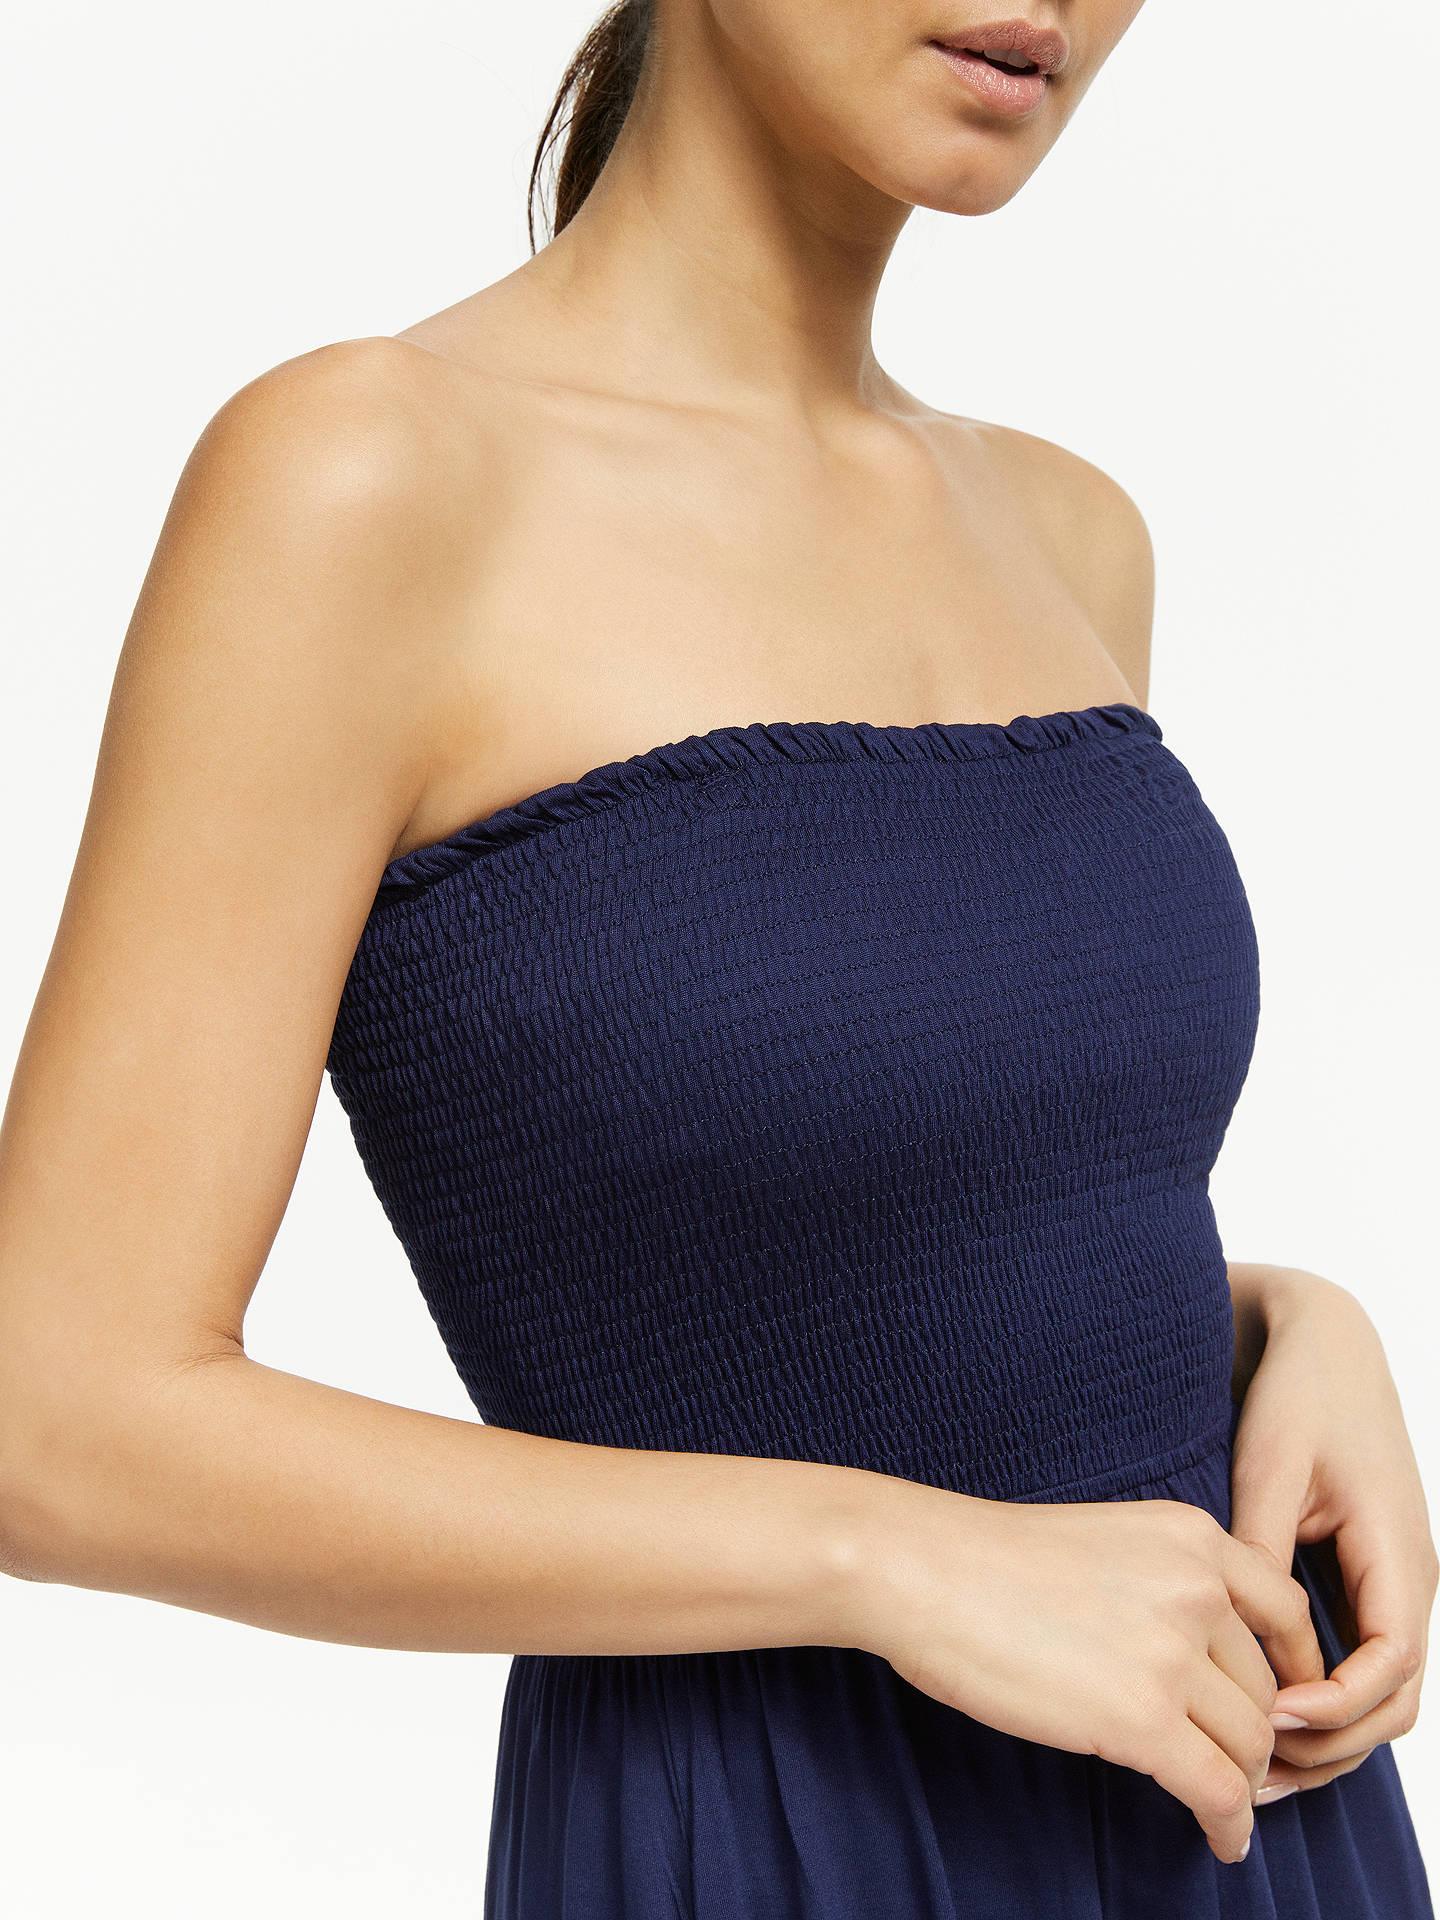 bc93befe7c5 ... Buy John Lewis & Partners Bandeau Jersey Maxi Dress, Navy, S Online at  johnlewis